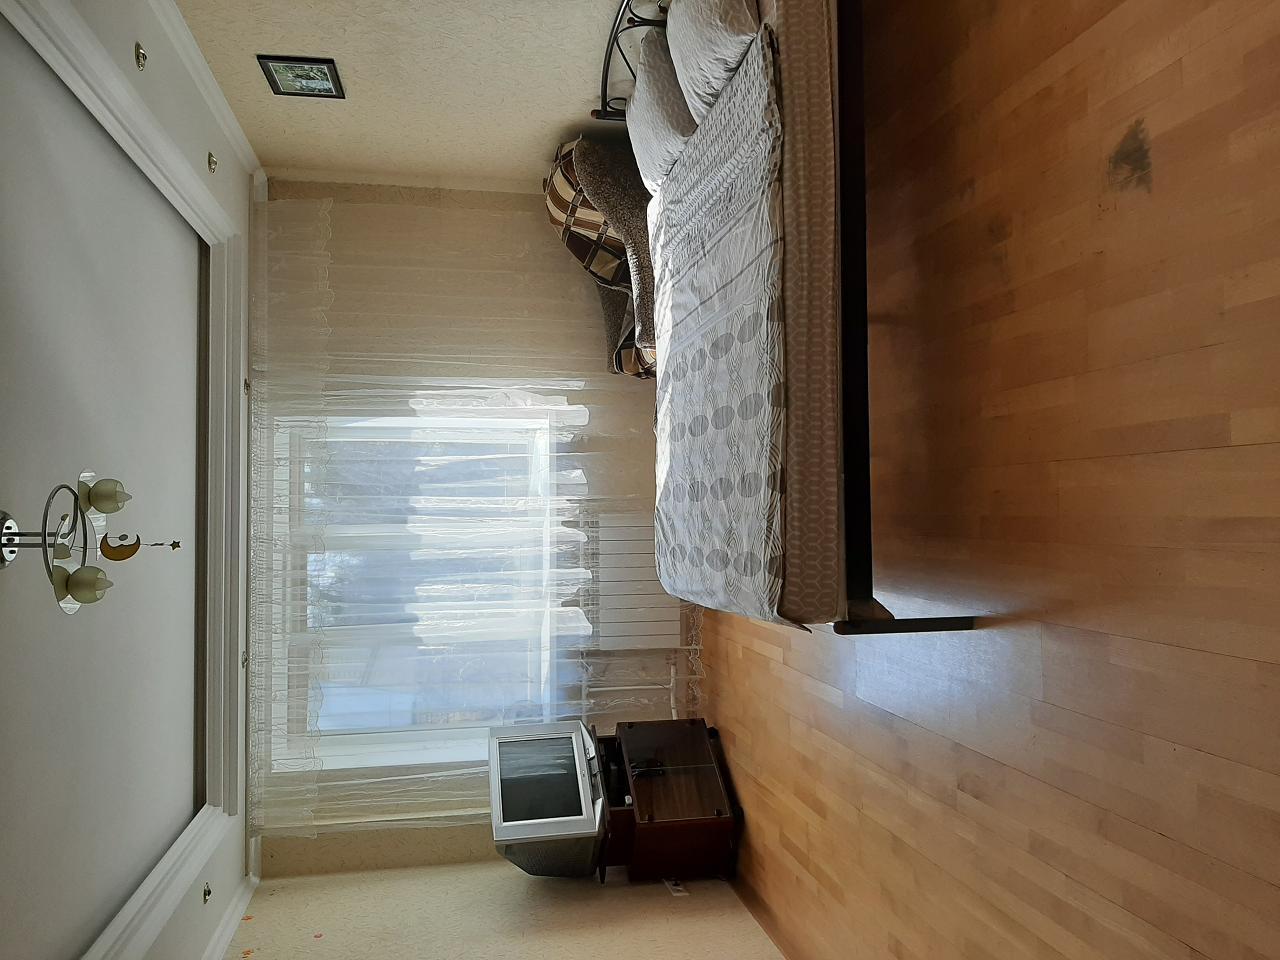 1-кімнатна квартира подобово, Київ, вул. Захарівська, 3а (1)